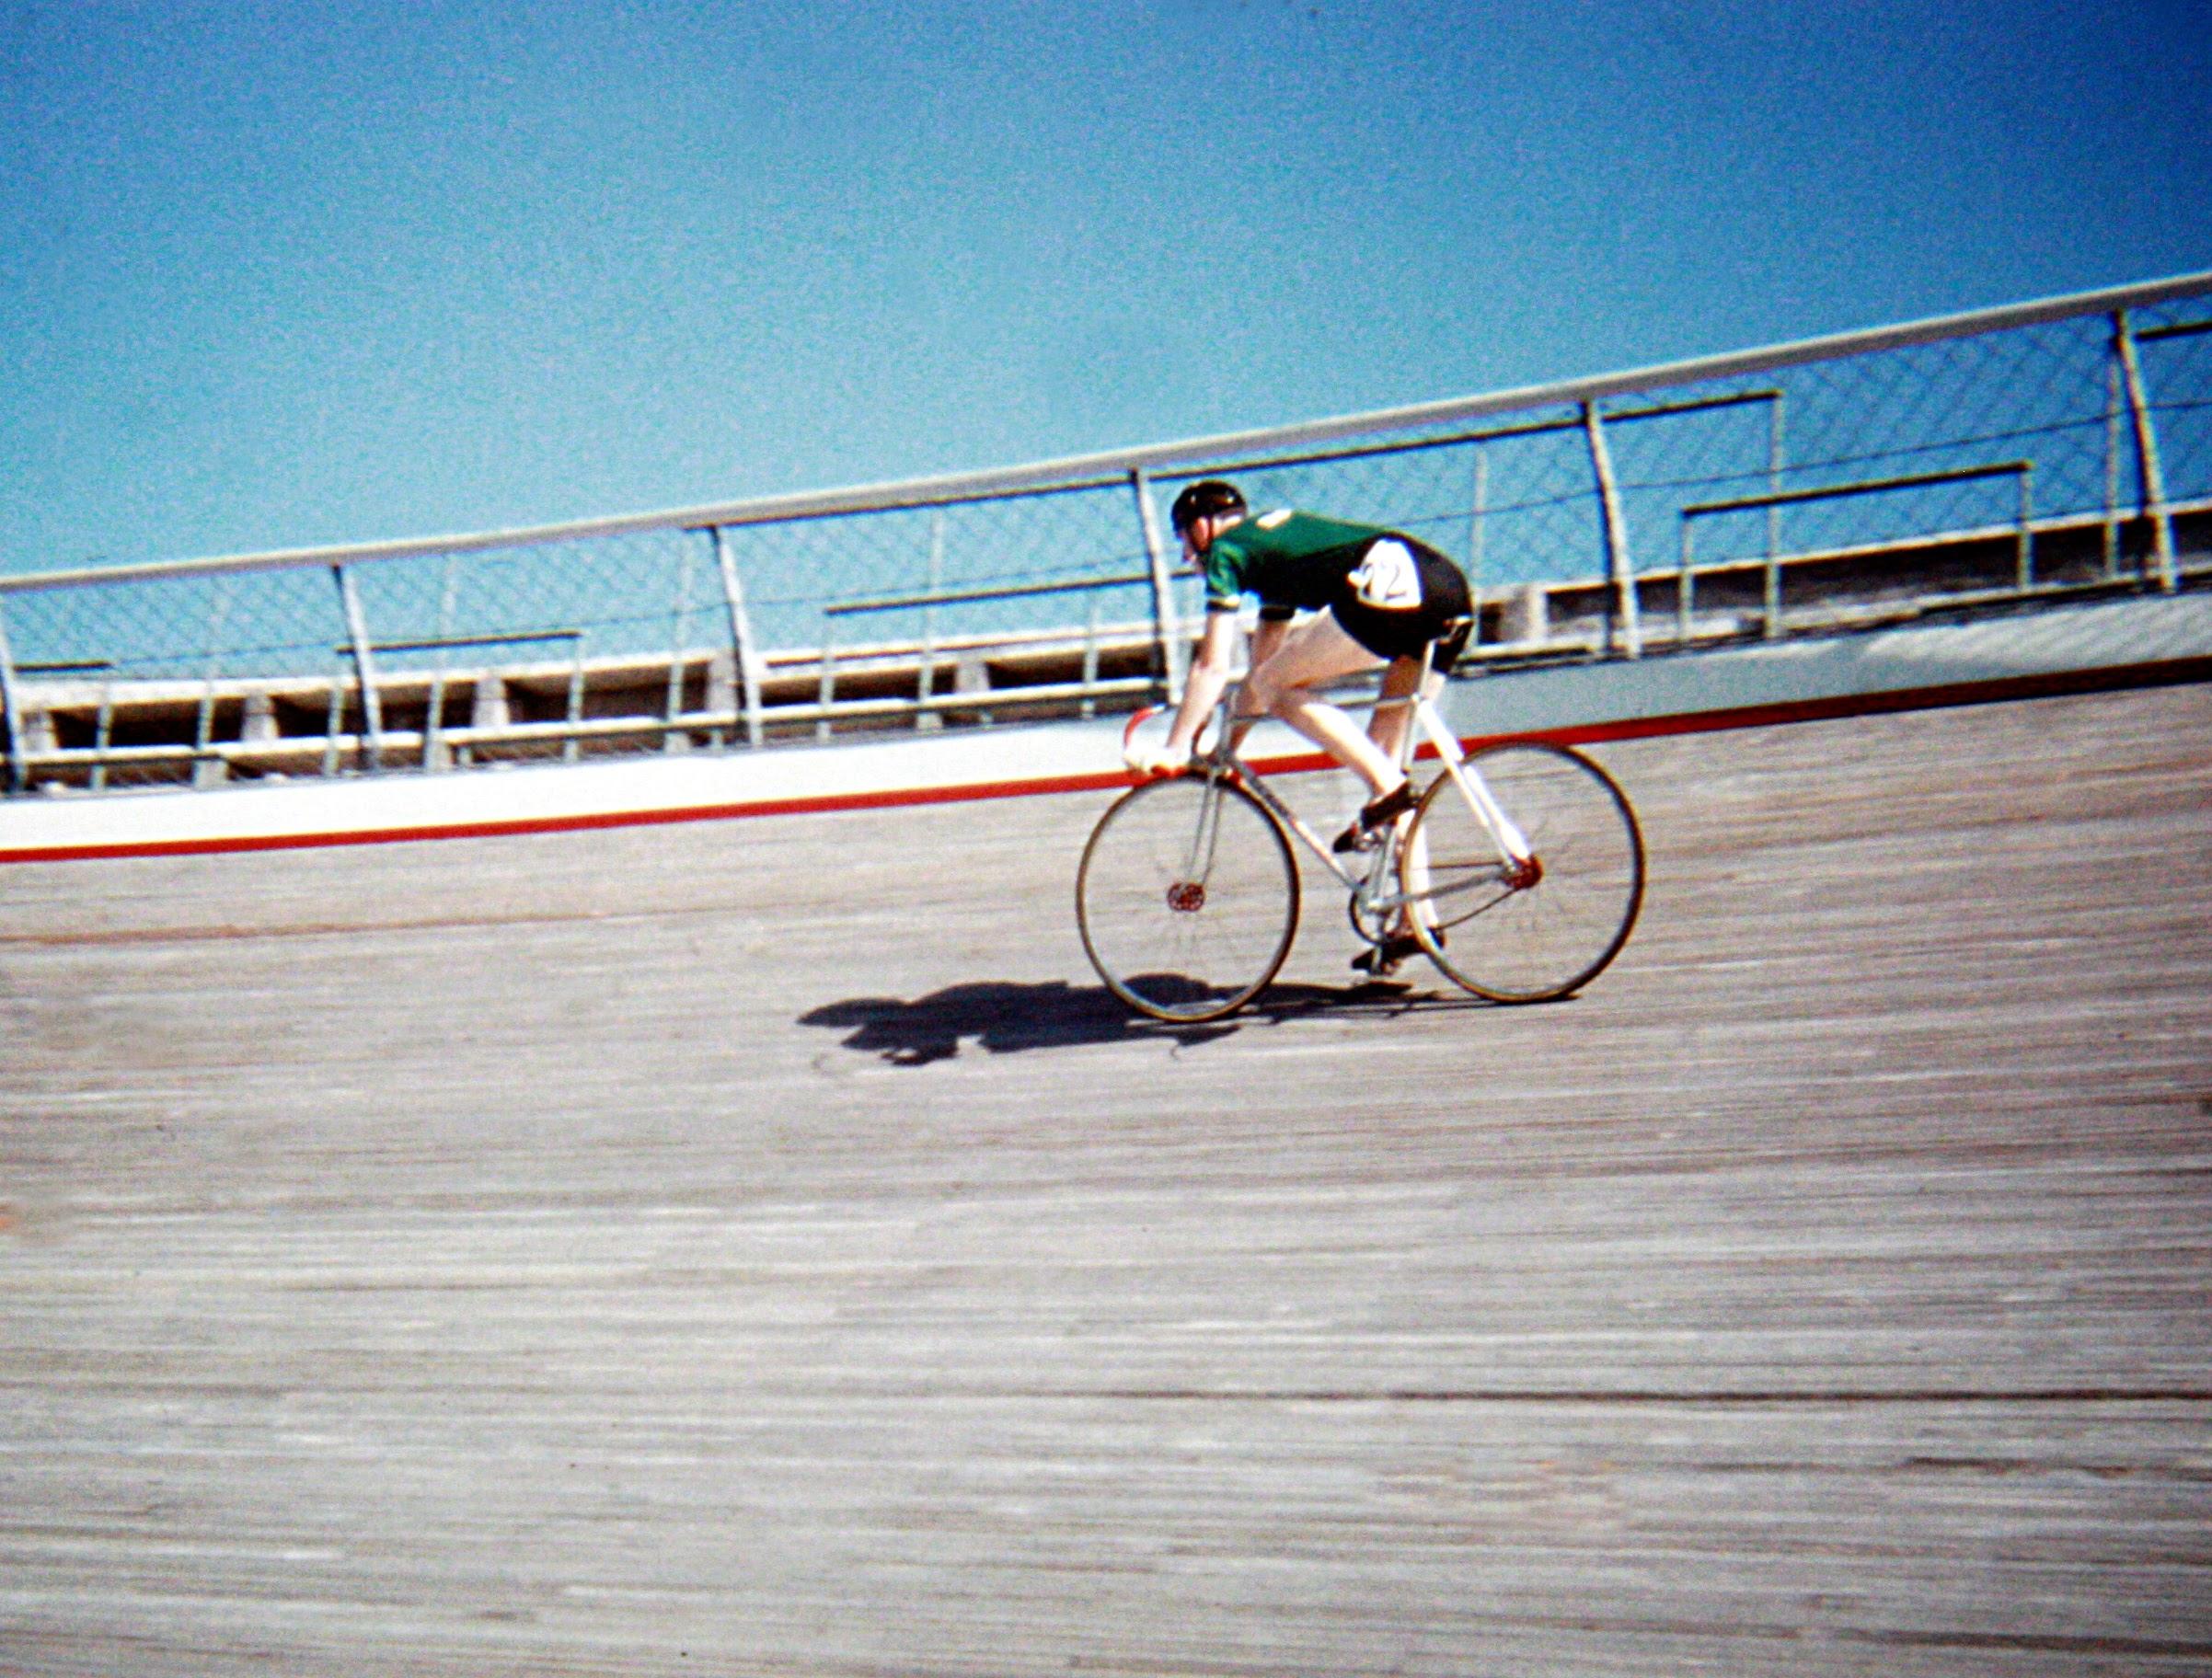 Mick Horgan riding up the banking at the Velodrome (Photo: © Sean B. Fox)